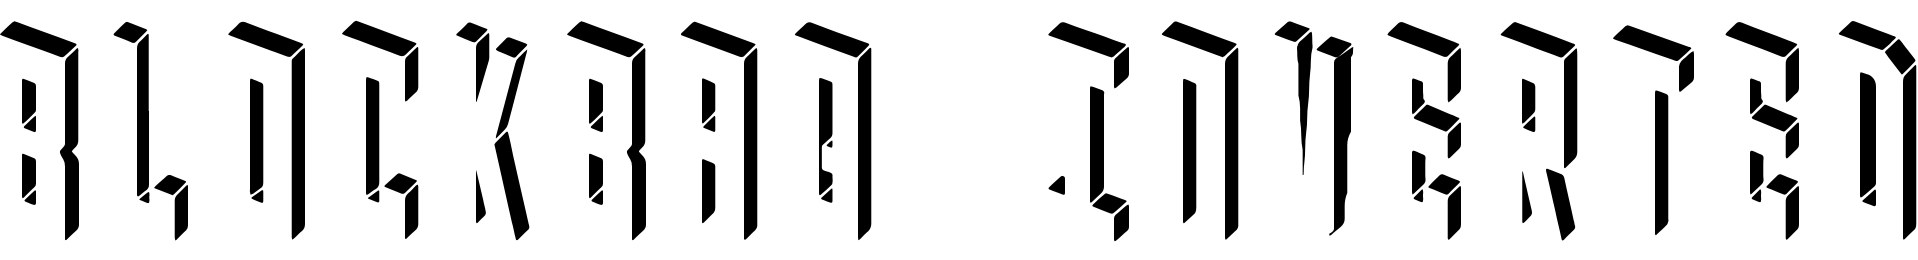 Blockbaq Inverted